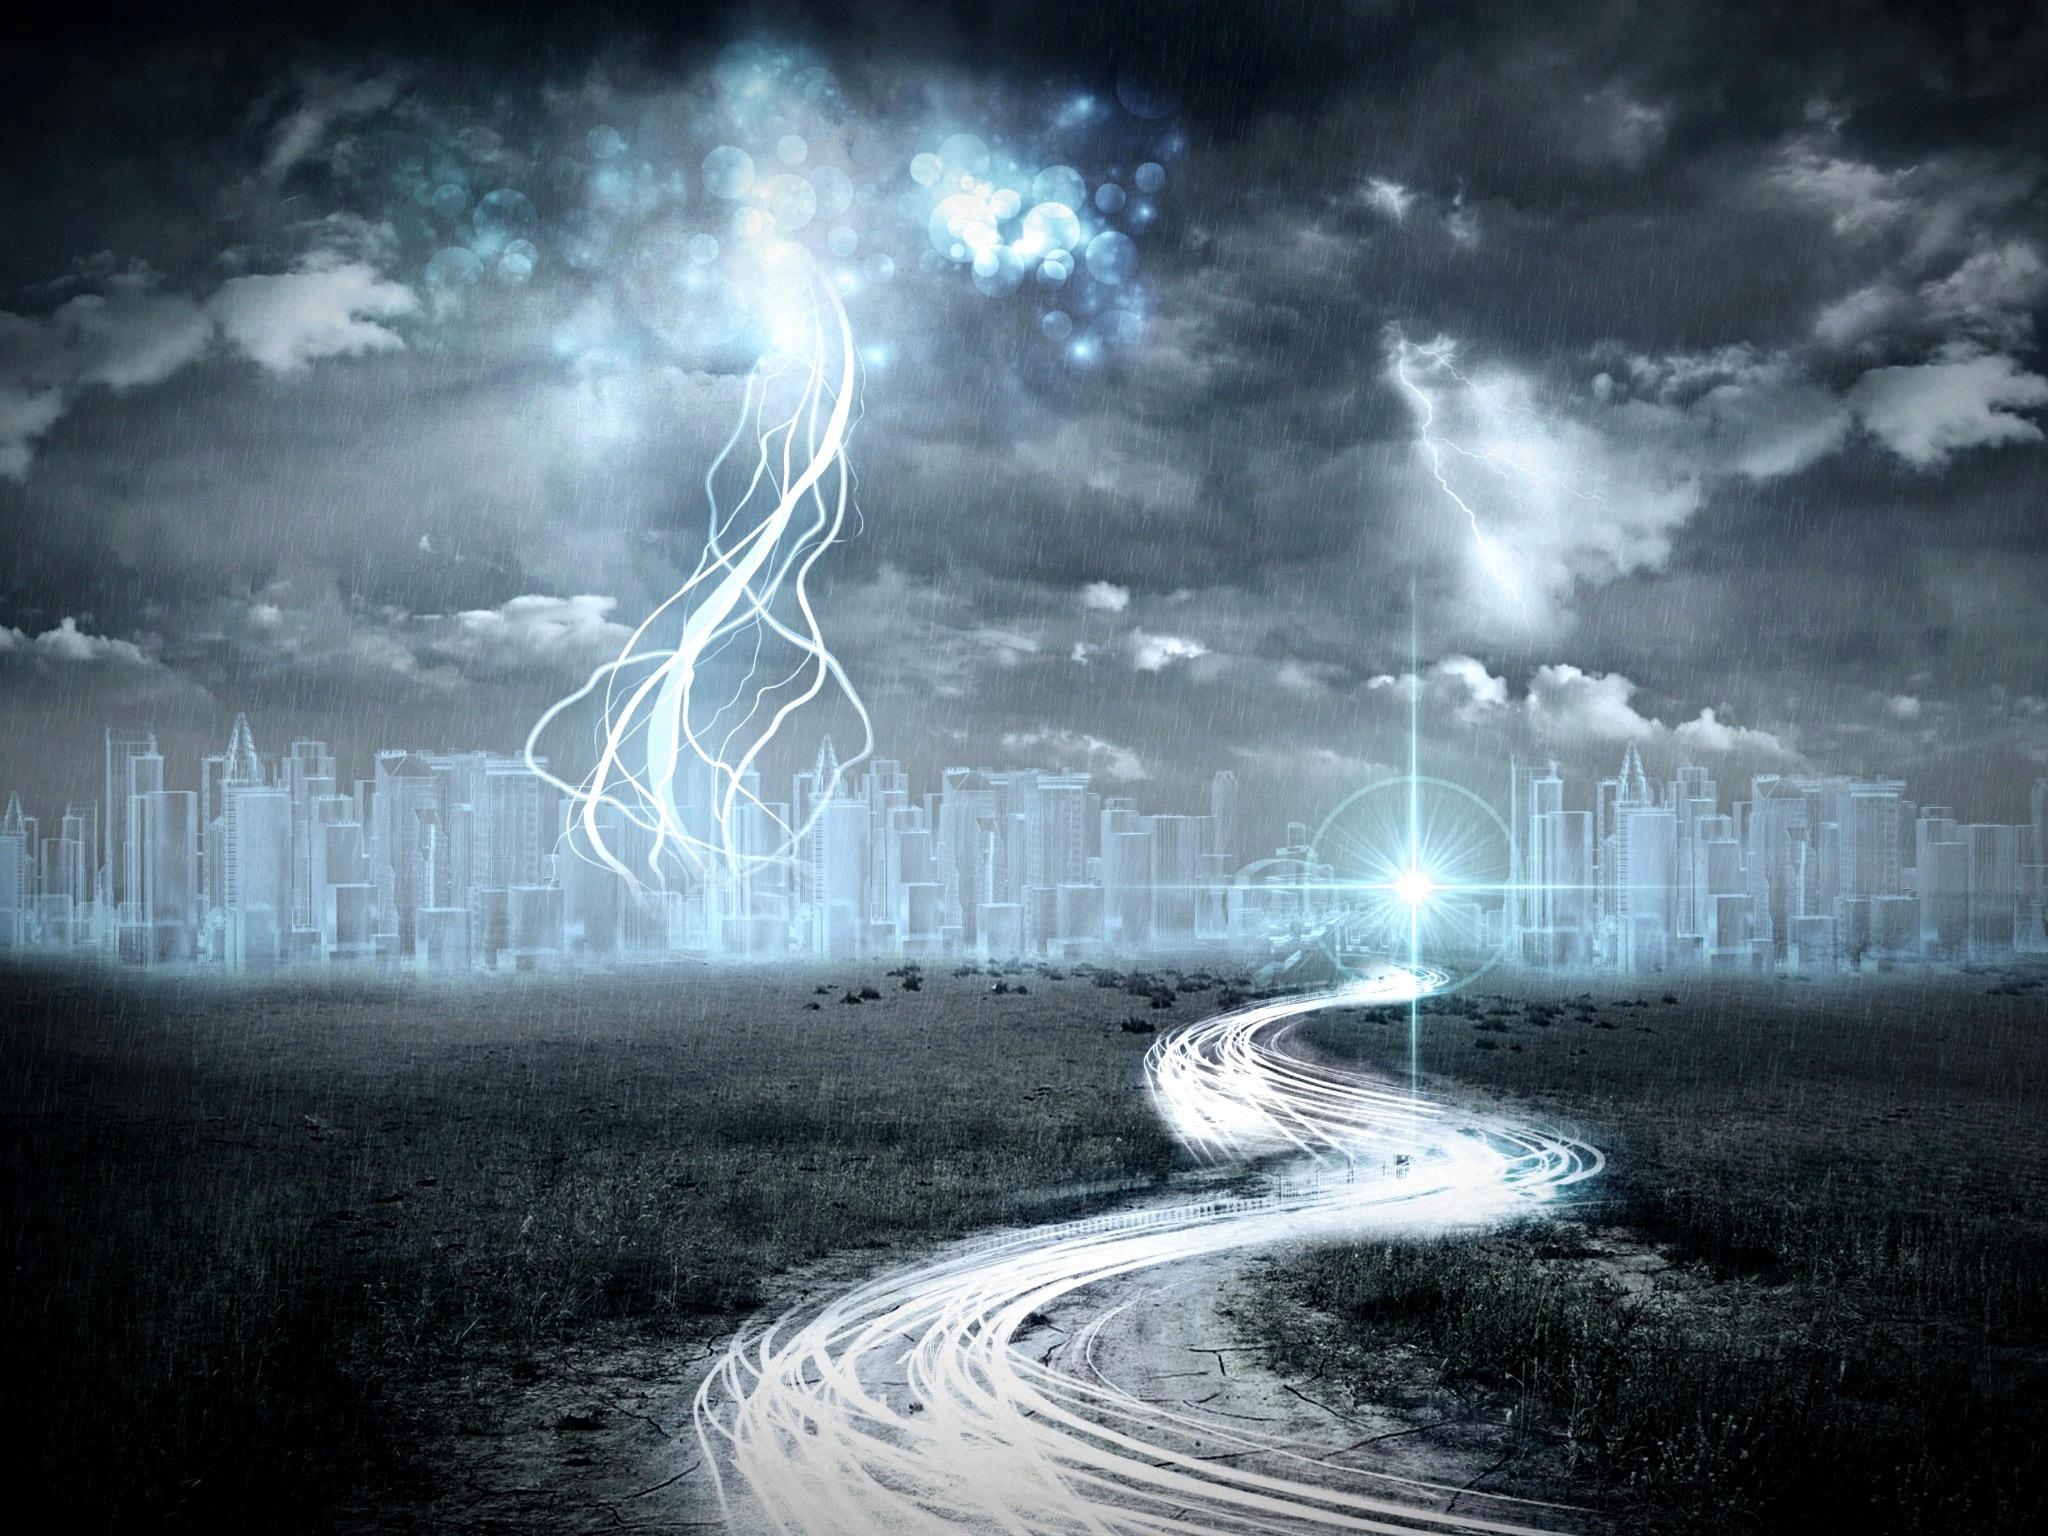 Sfondi Paesaggio Bianca Notte Cielo Fulmine Tempesta Verde